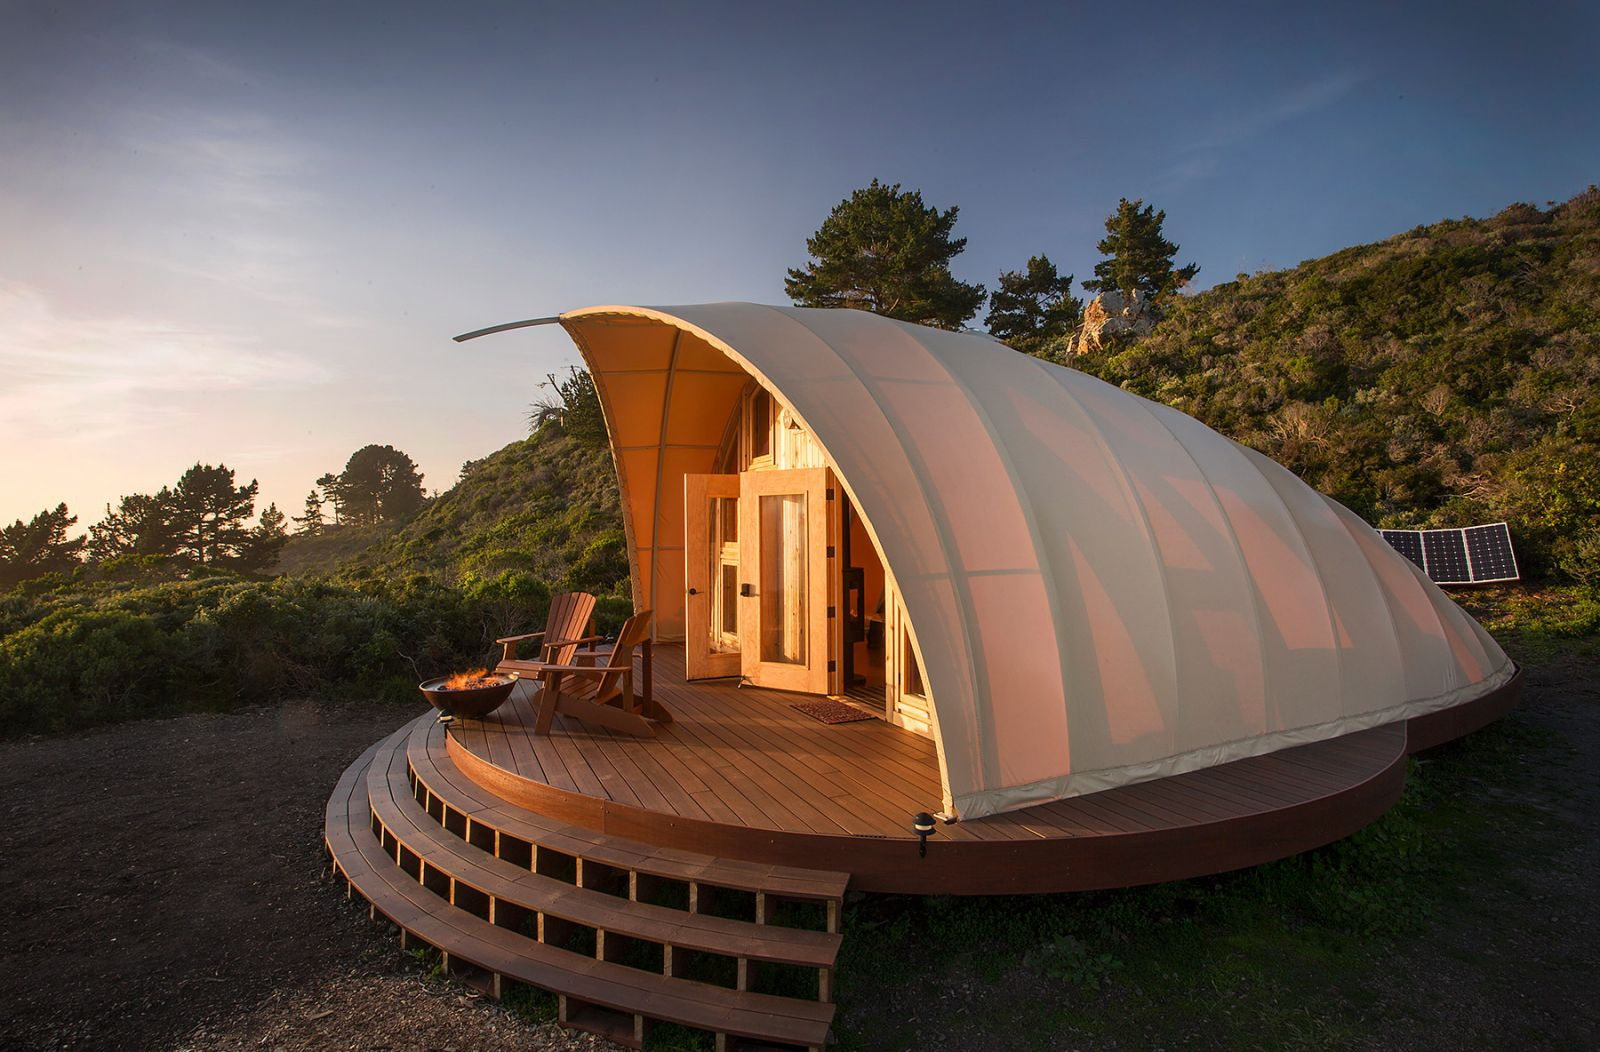 luxus camping glamping mobile architektur autonomous tent umweltschonend. Black Bedroom Furniture Sets. Home Design Ideas